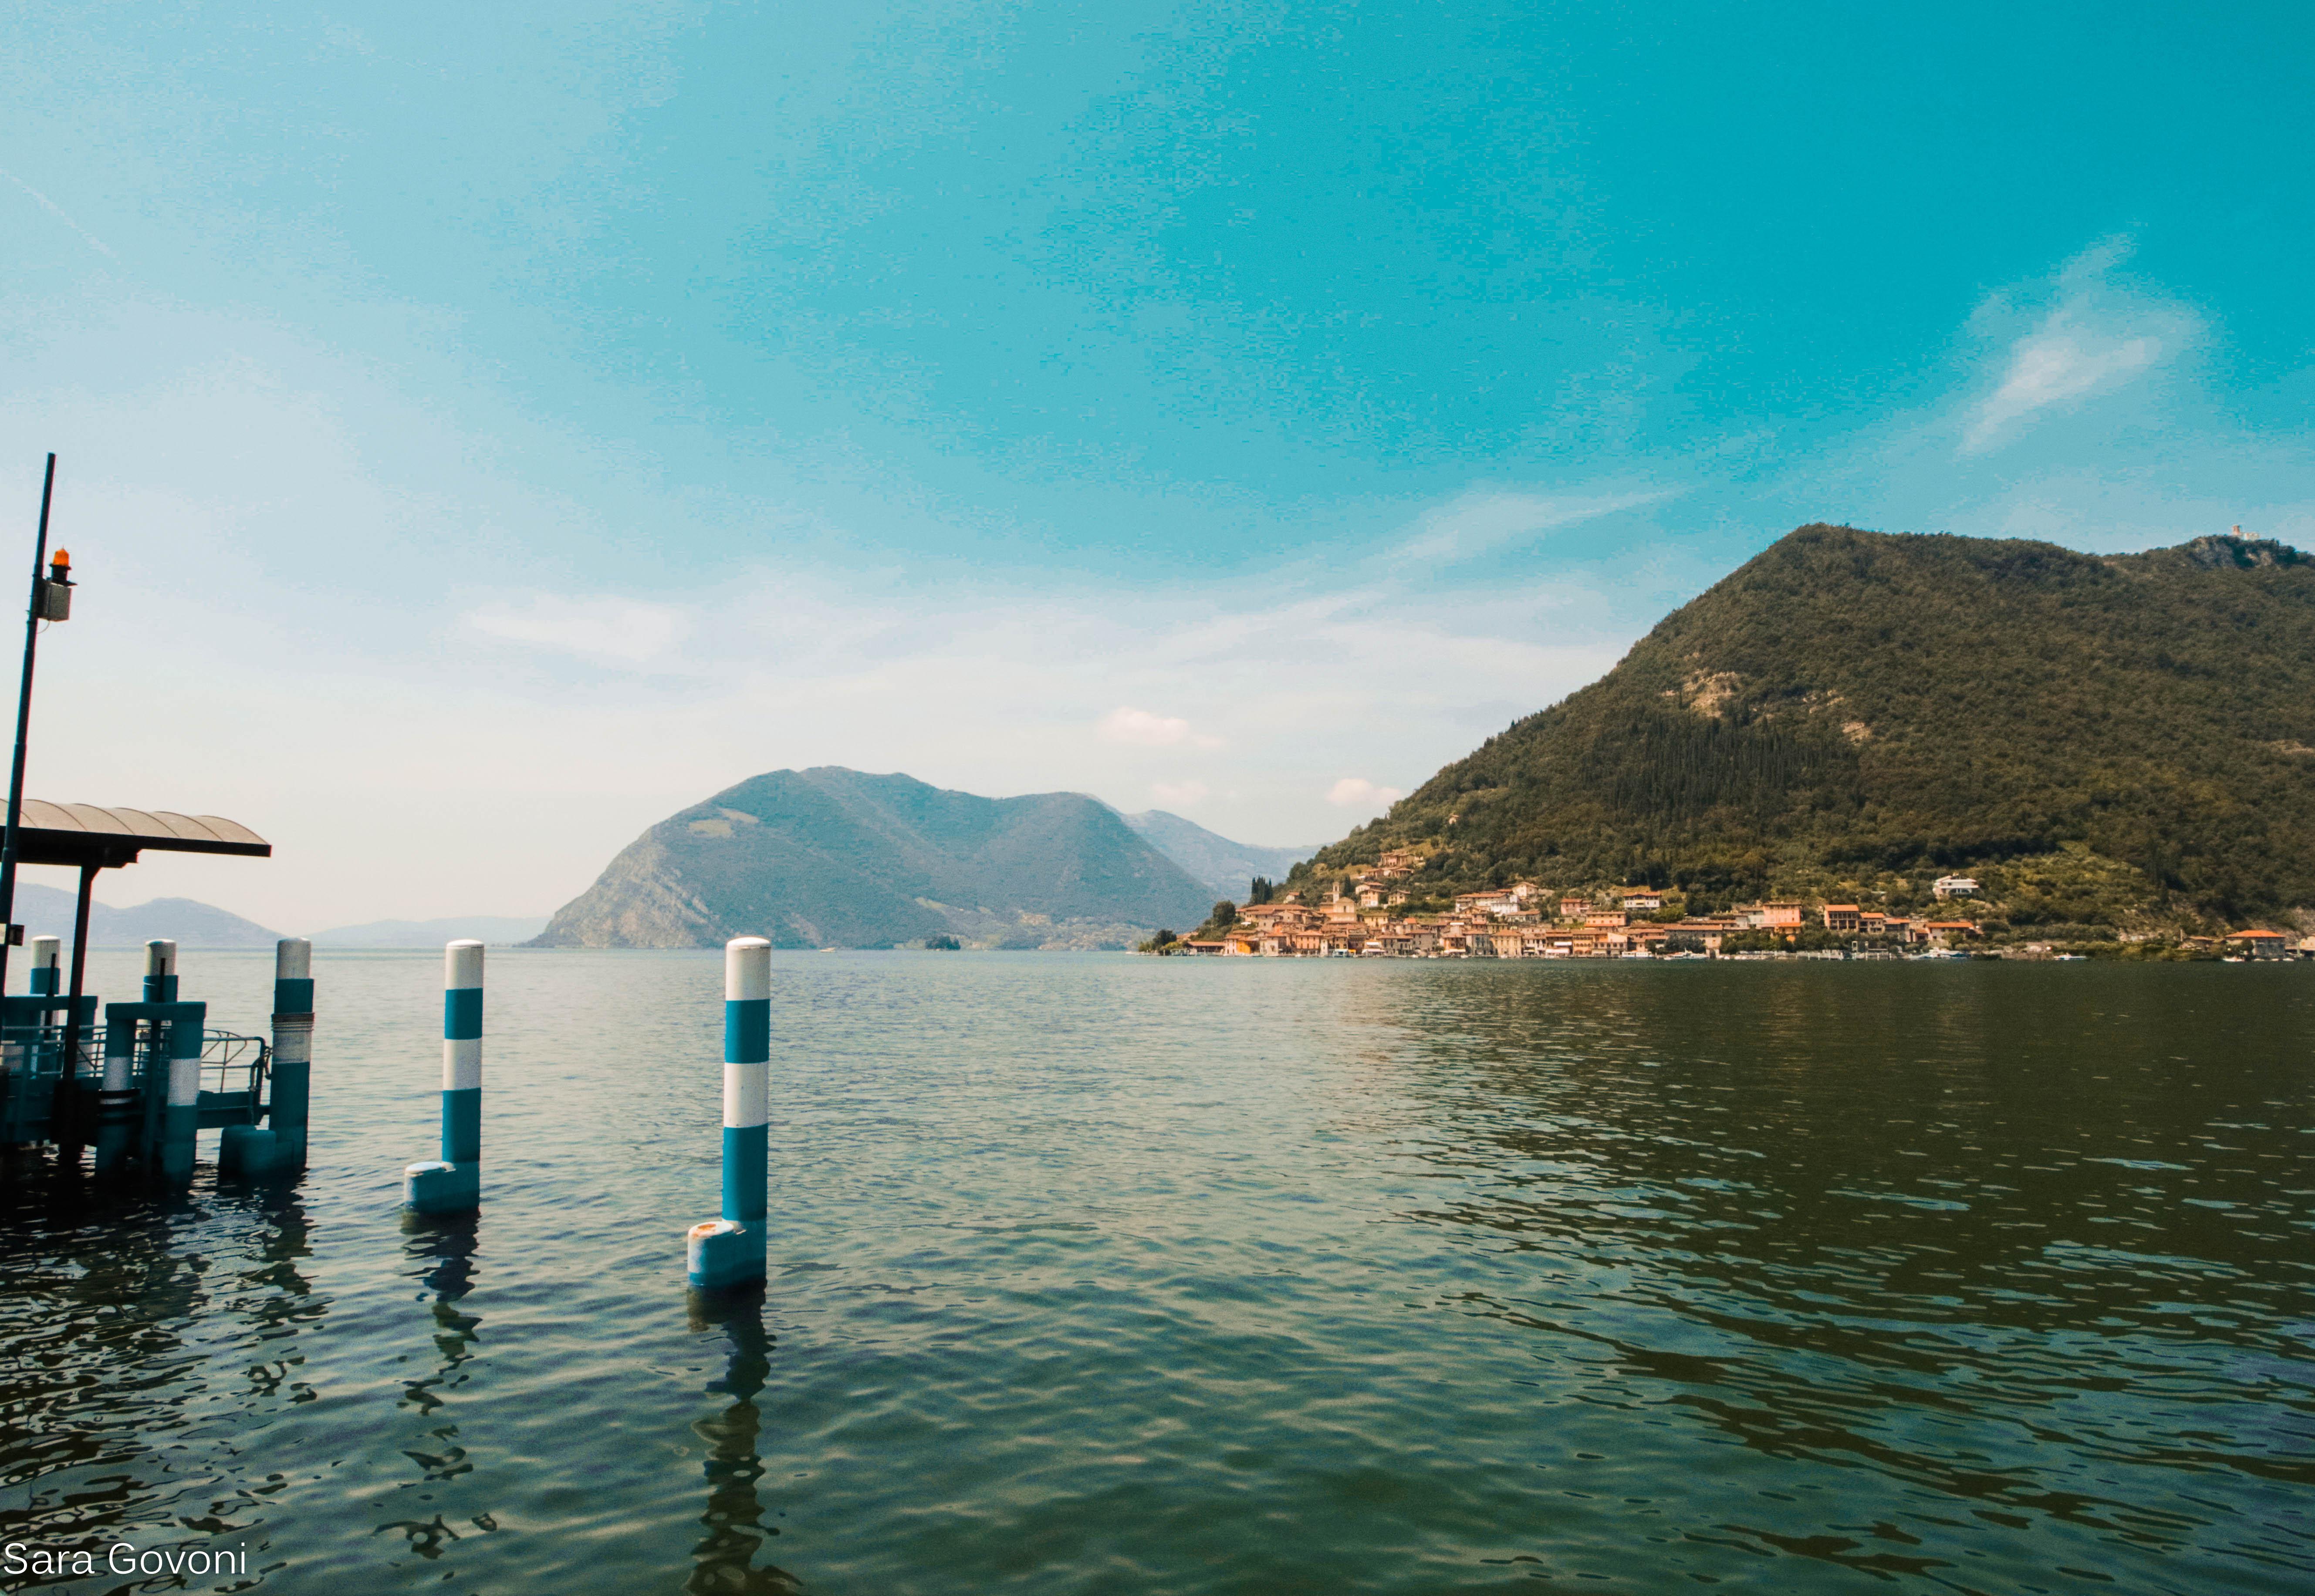 Sul lago d'Iseo on the road: tutti i consigli parte 2